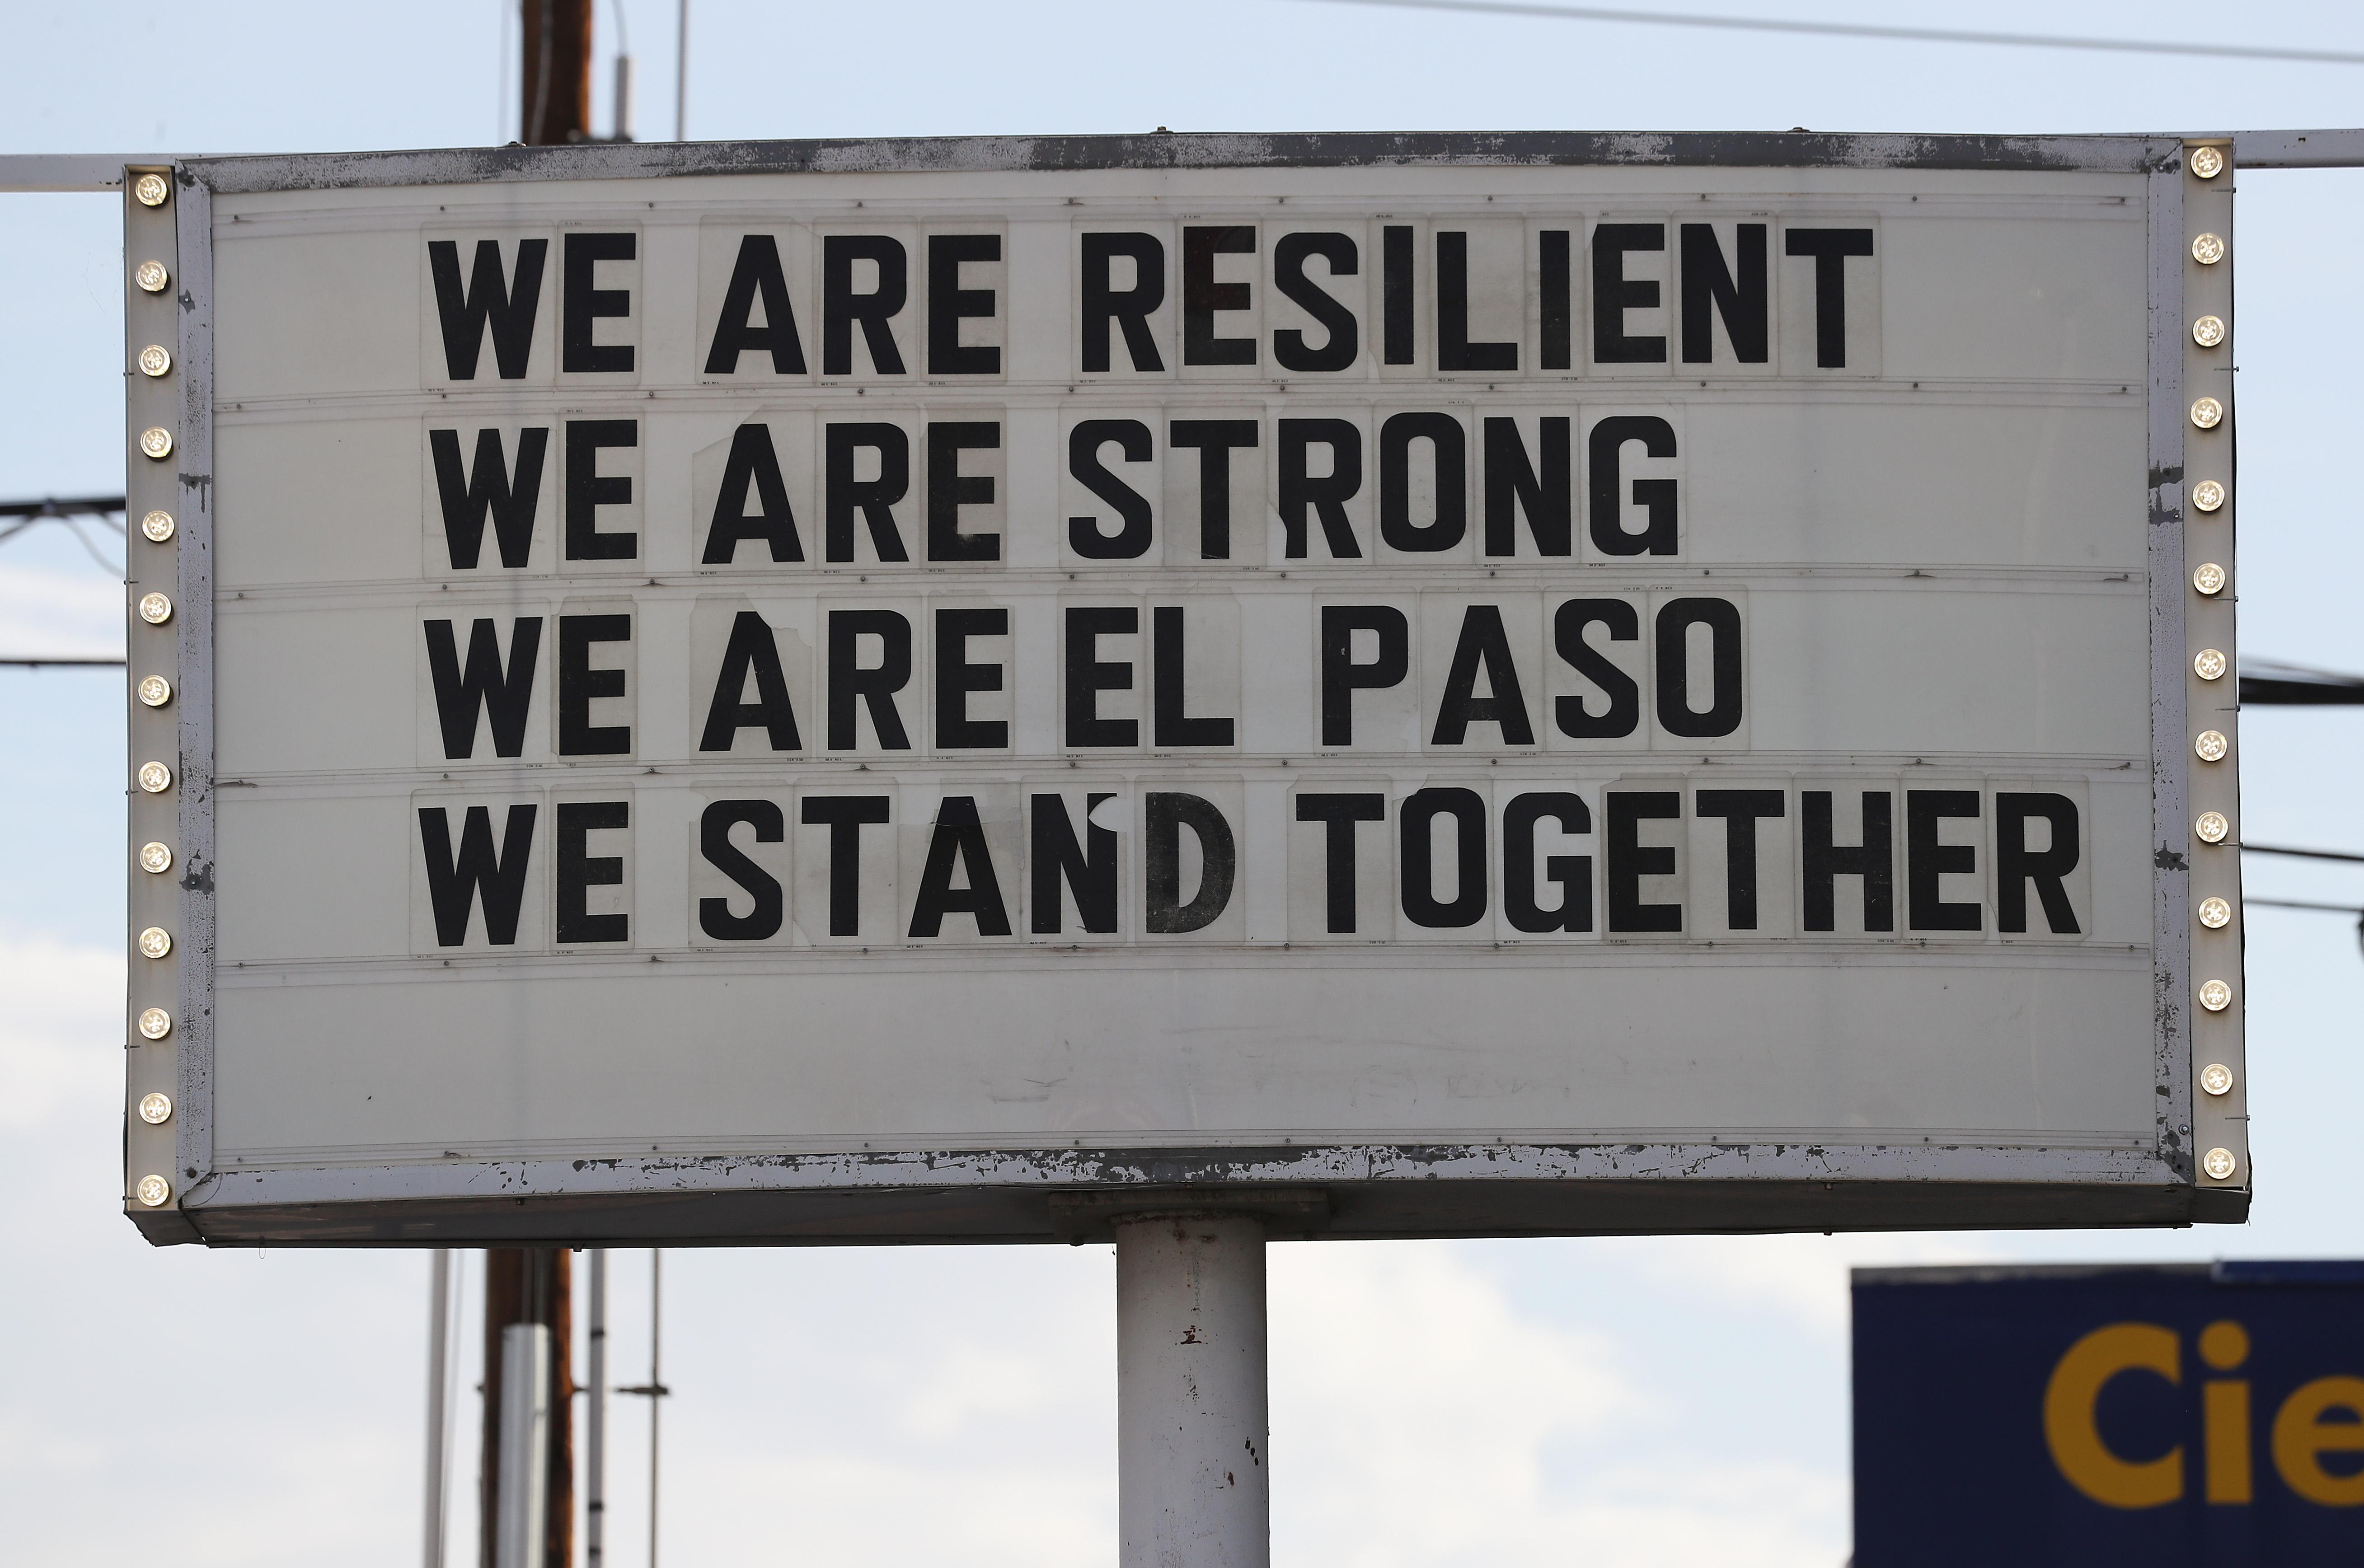 El Paso Walmart shooting: what we know